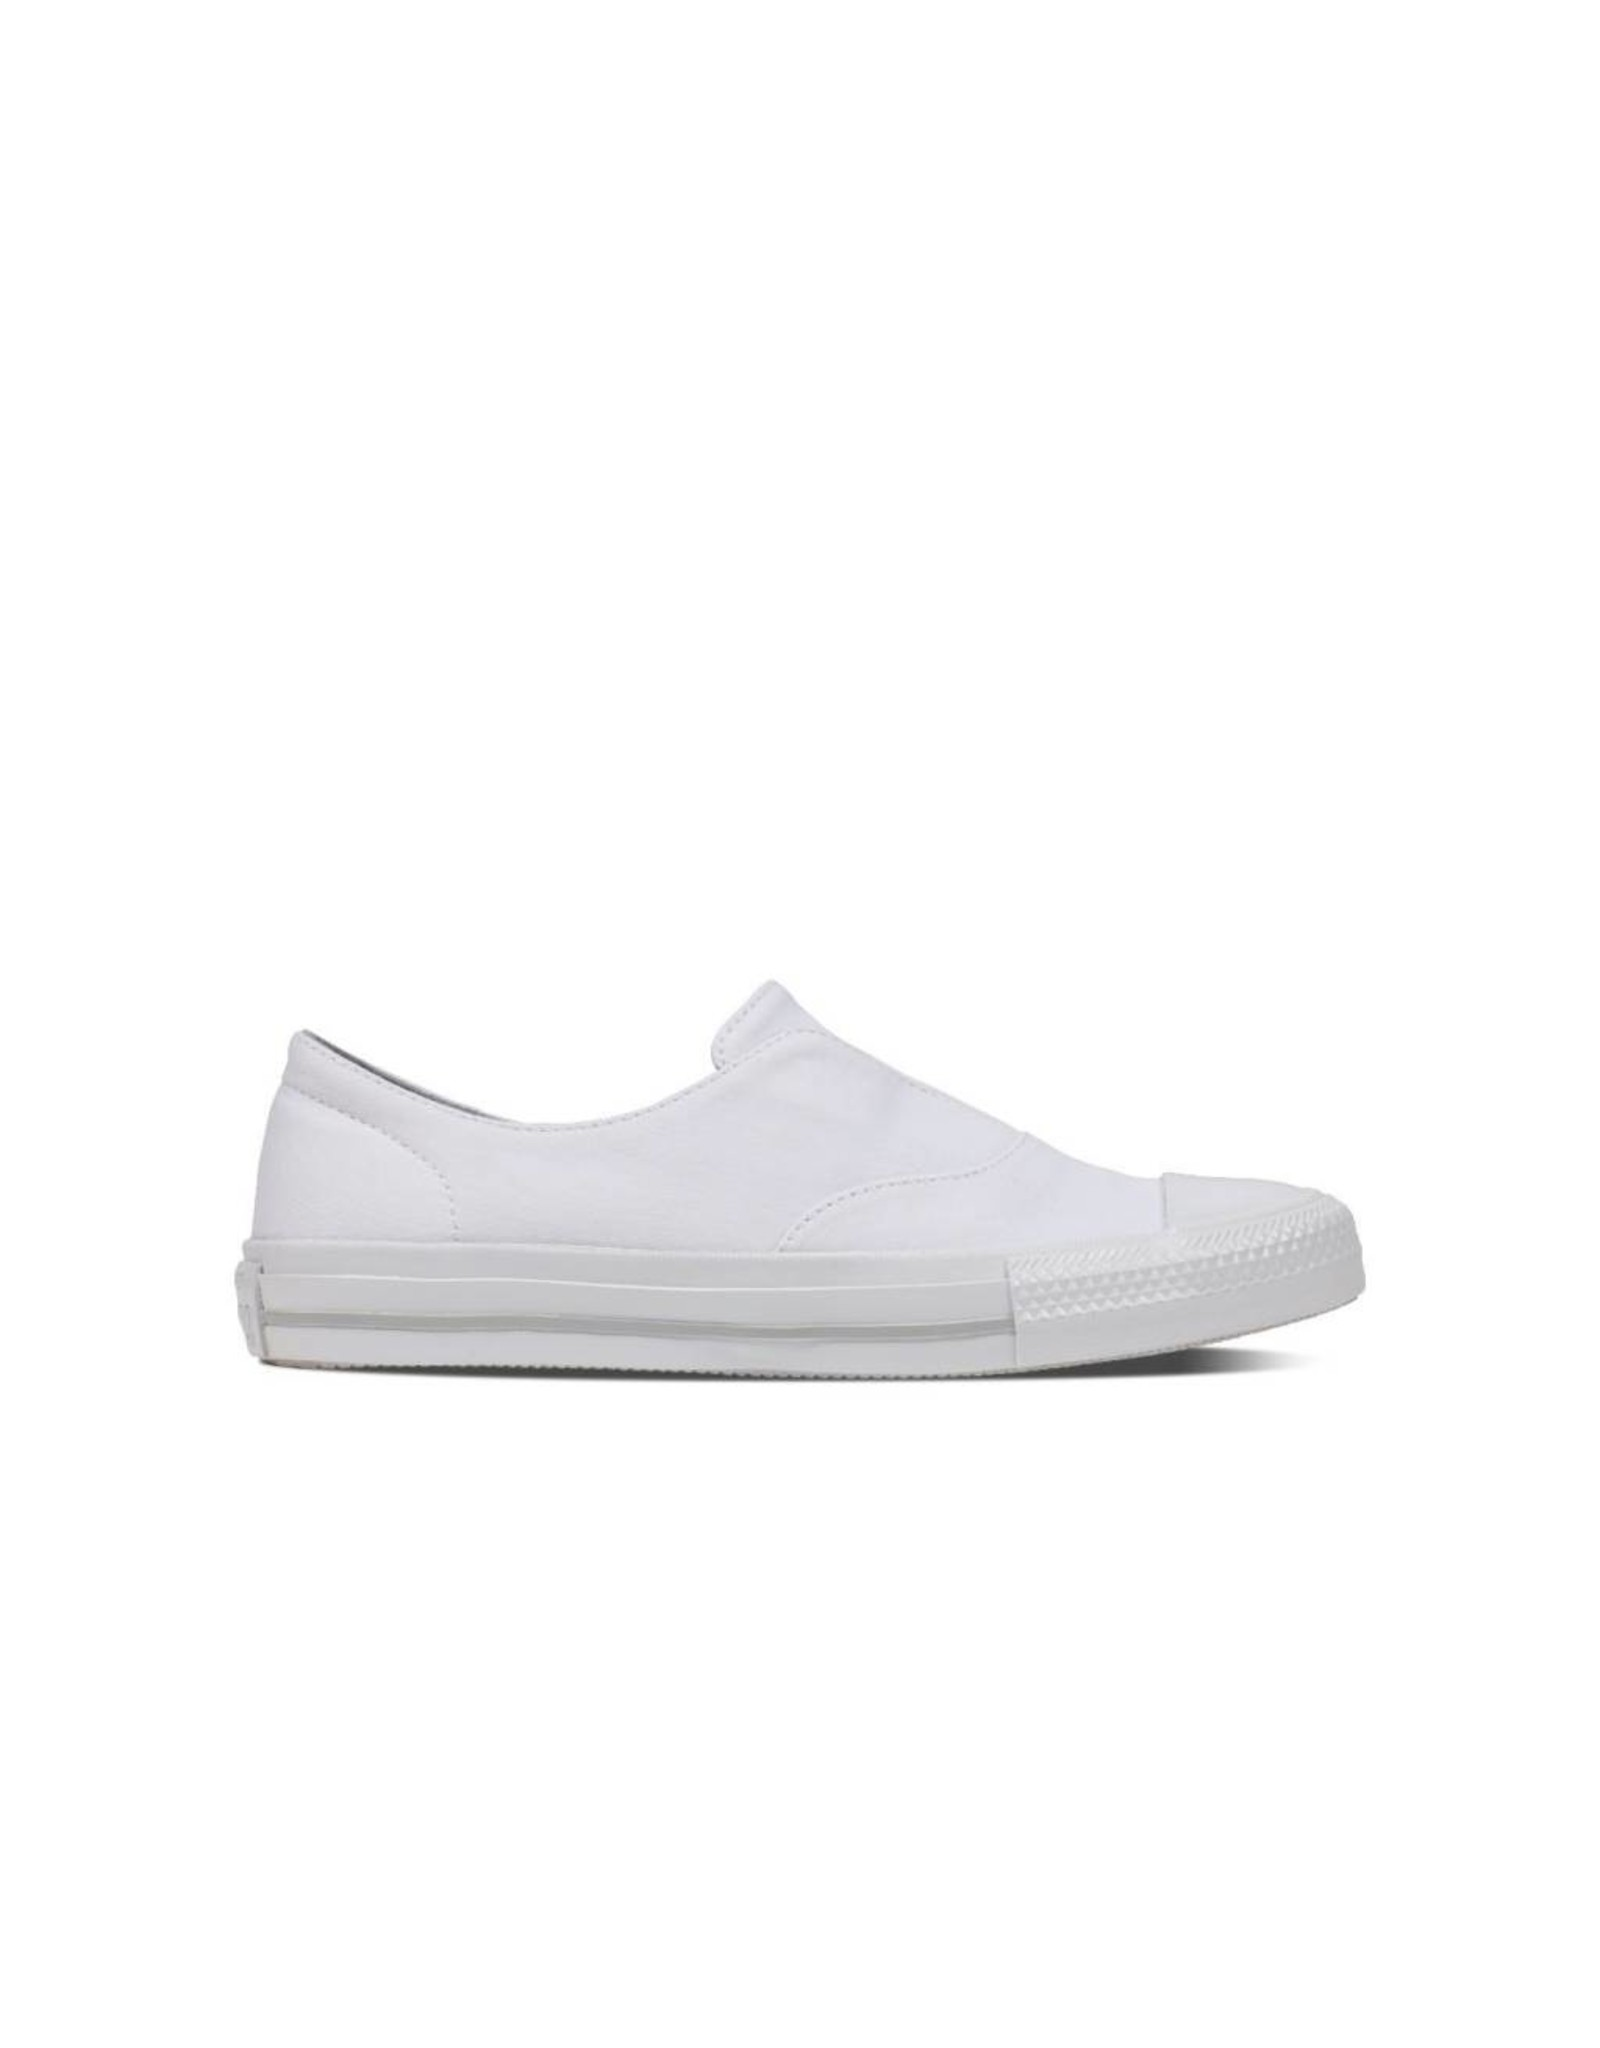 CONVERSE CHUCK TAYLOR GEMMA SLIP WHITE/WHITE/MOUSE C784W-555900C